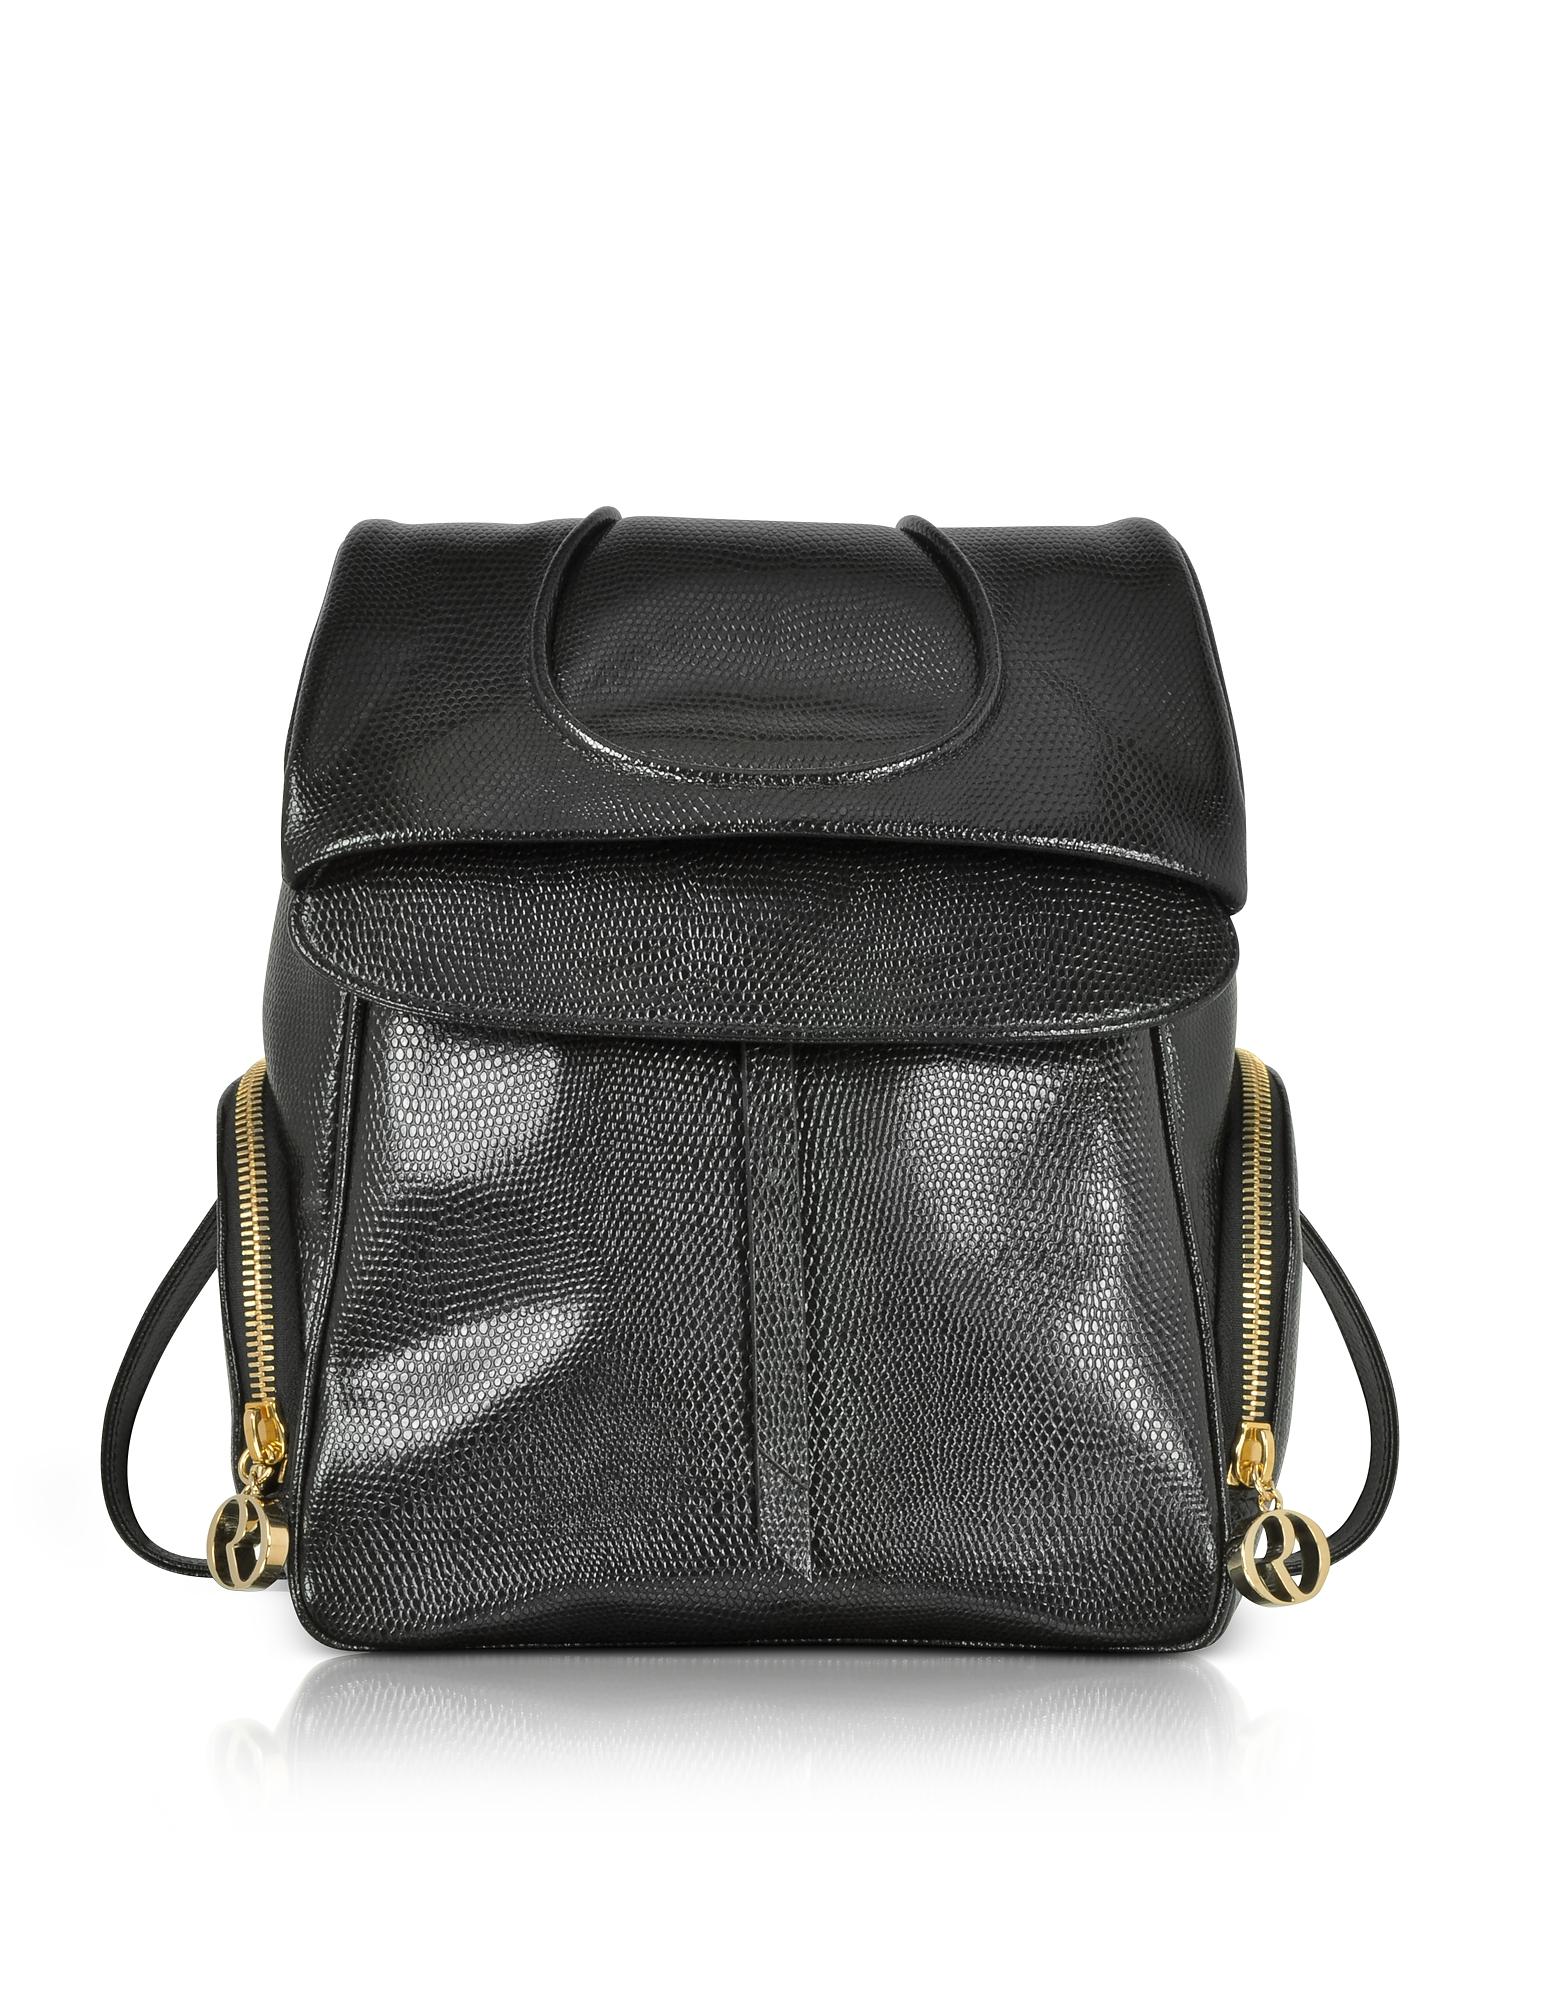 Black Lizard Embossed Leather Backpack